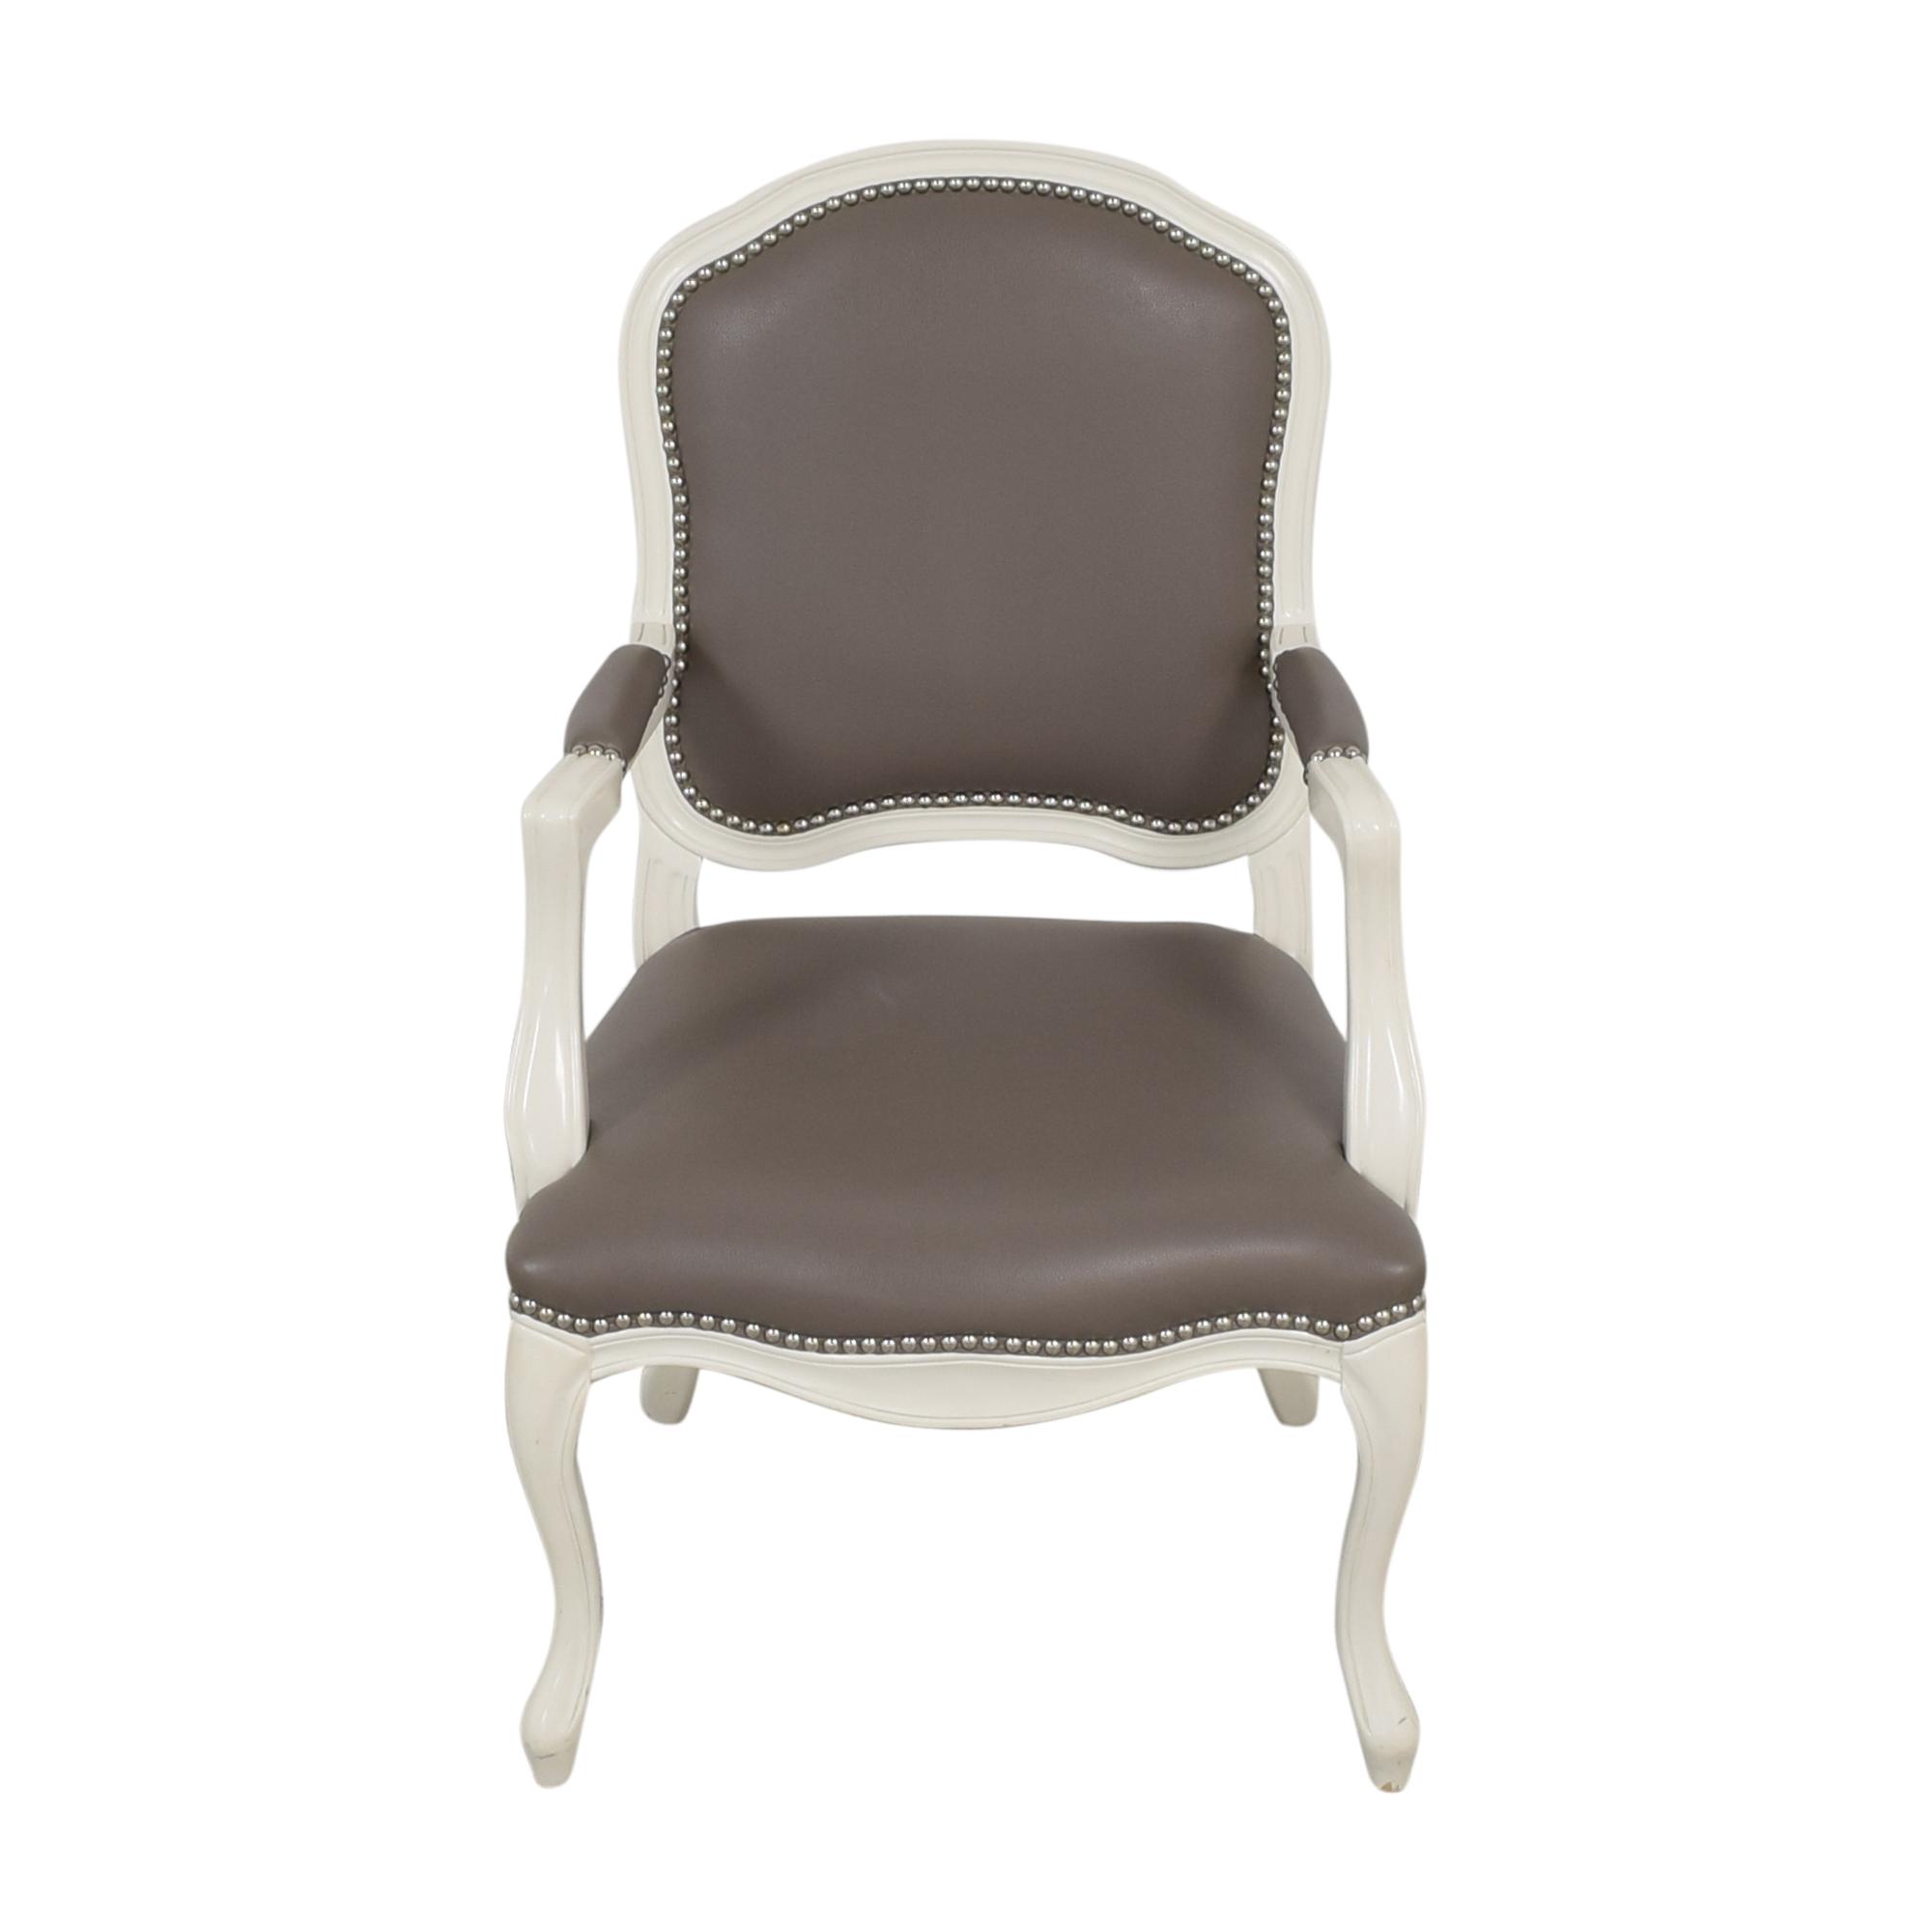 CB2 CB2 Stick Around Arm Chair by Novogratz white and grey